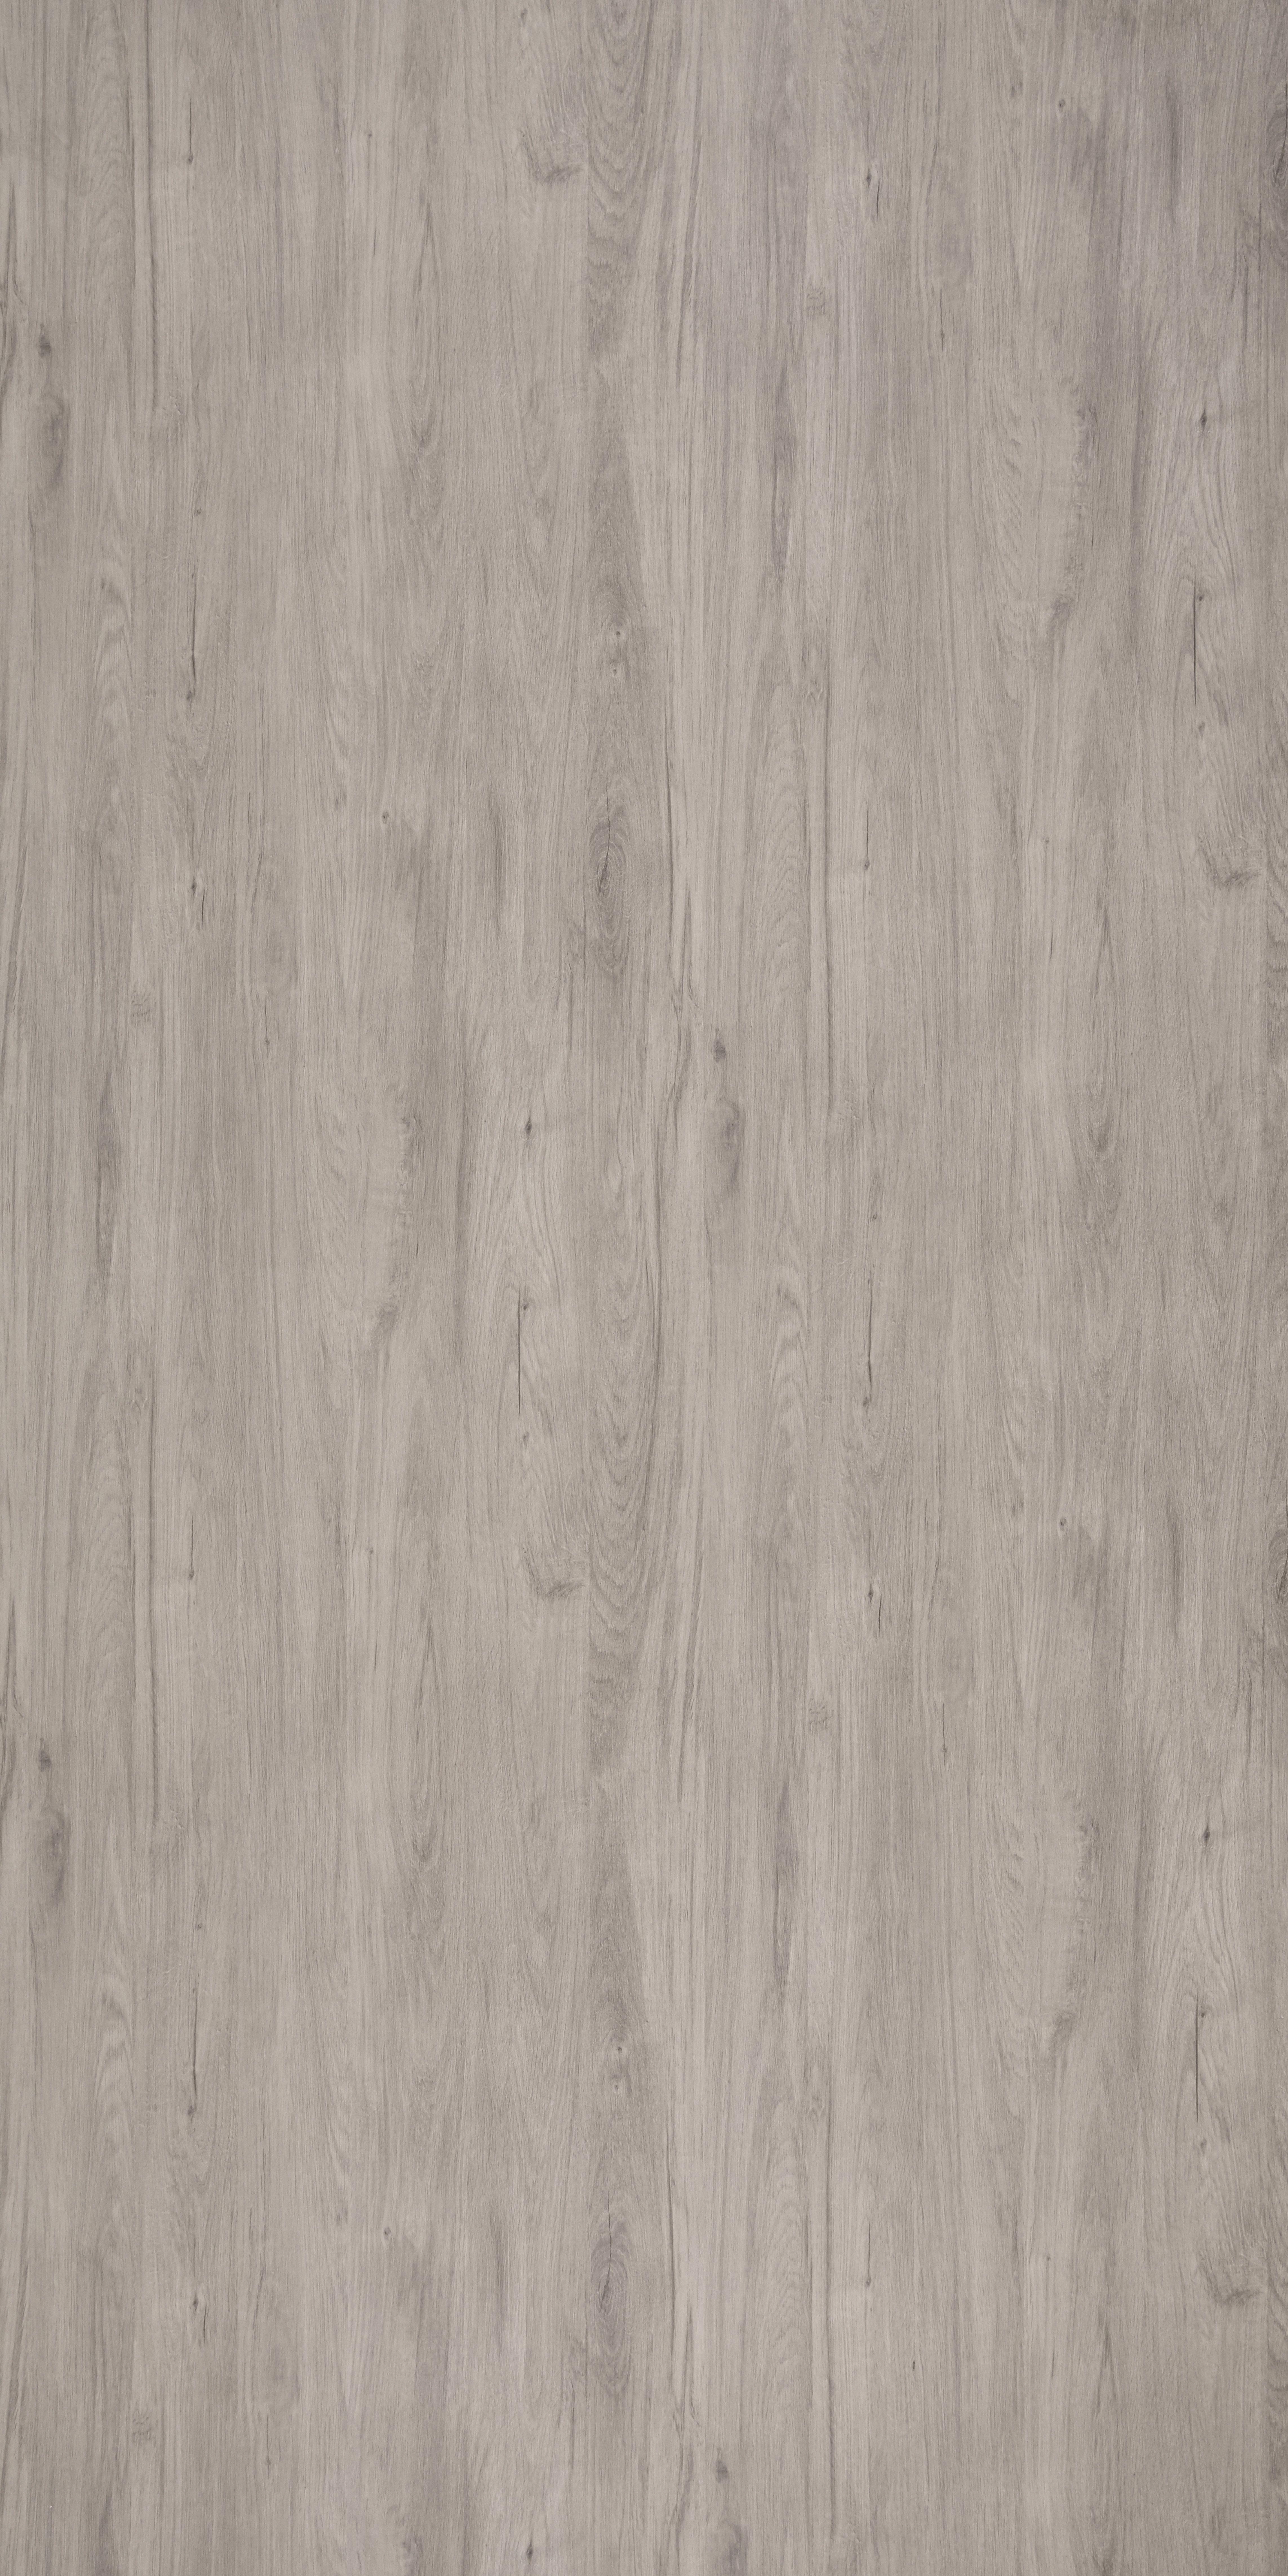 Edl Dwe 9007l Hipster Oak Materials In 2019 Oak Wood